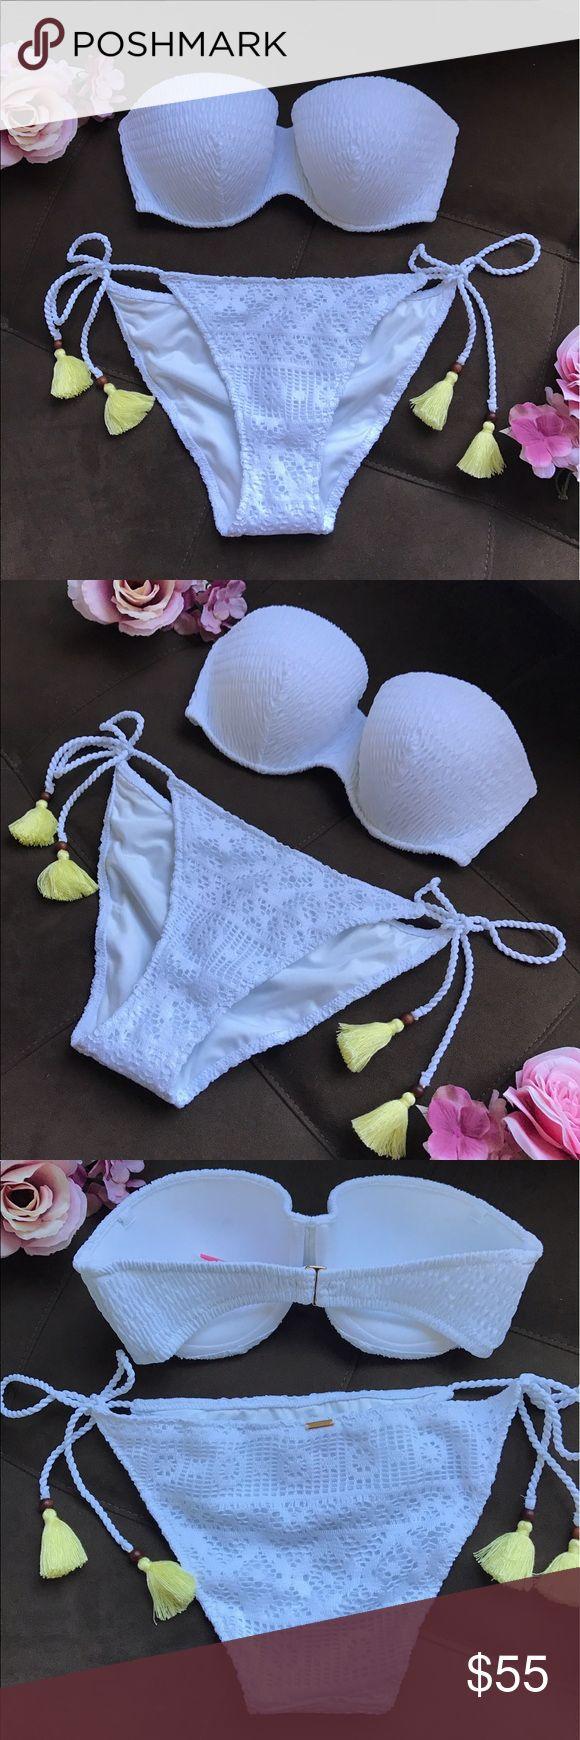 Victoria's Secret White Tassel Swimsuit Victoria's Secret White Swimsuit with neon tassels. Top is size 32DD, bottoms are M. NWT, no trades. Only selling as a set. Victoria's Secret Swim Bikinis